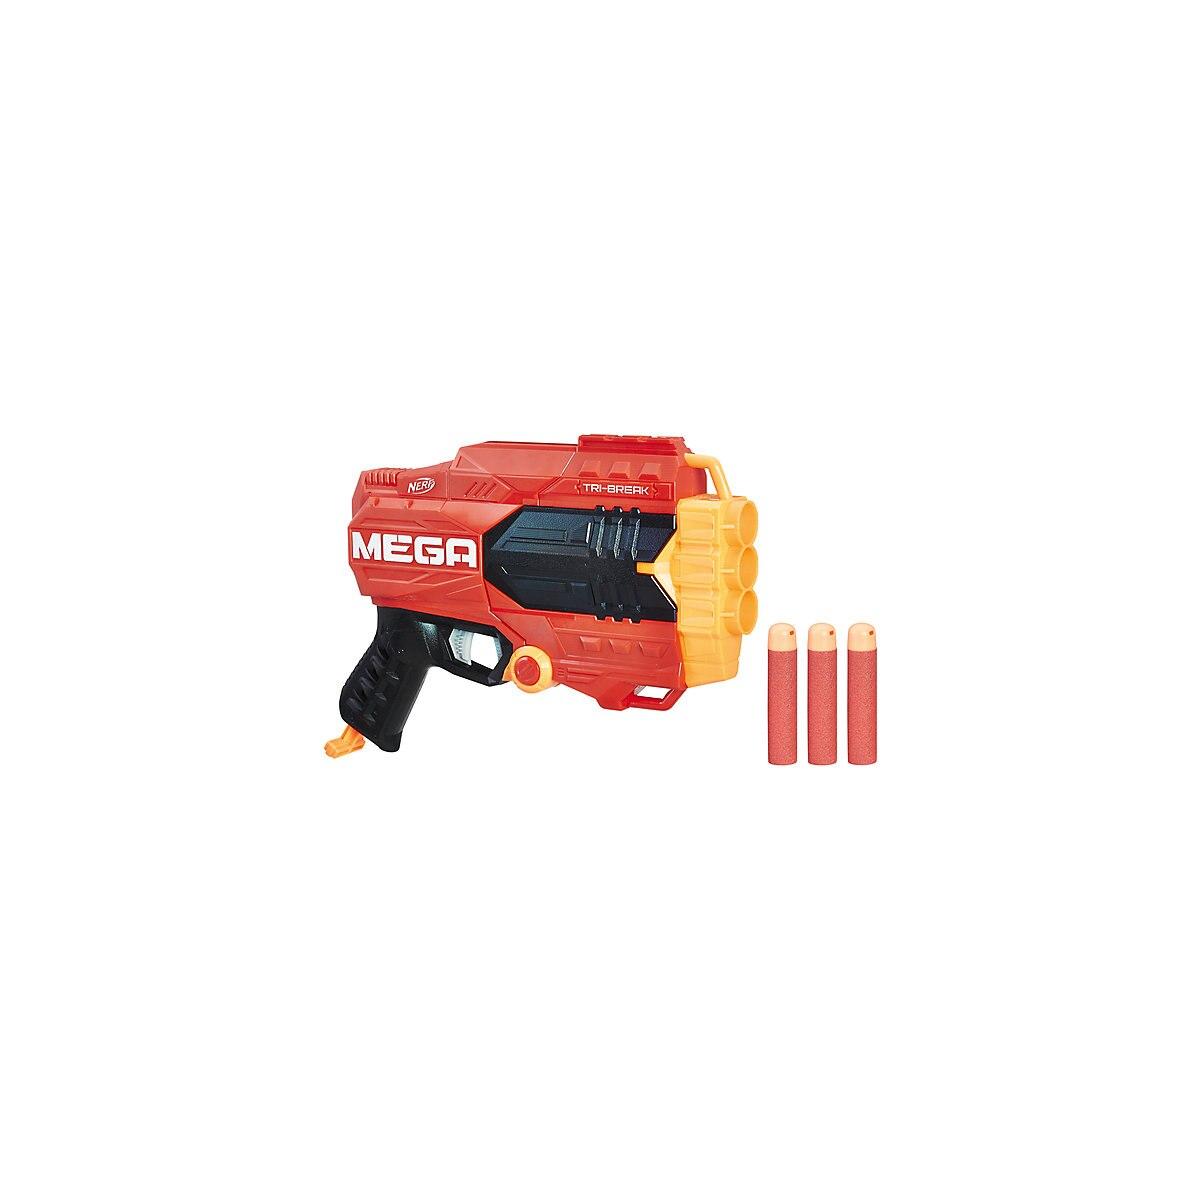 NERF jouet pistolets 7922801 pistolet arme jouets jeux pneumatique blaster garçon orbiz revolver plein air plaisir sport MTpromo